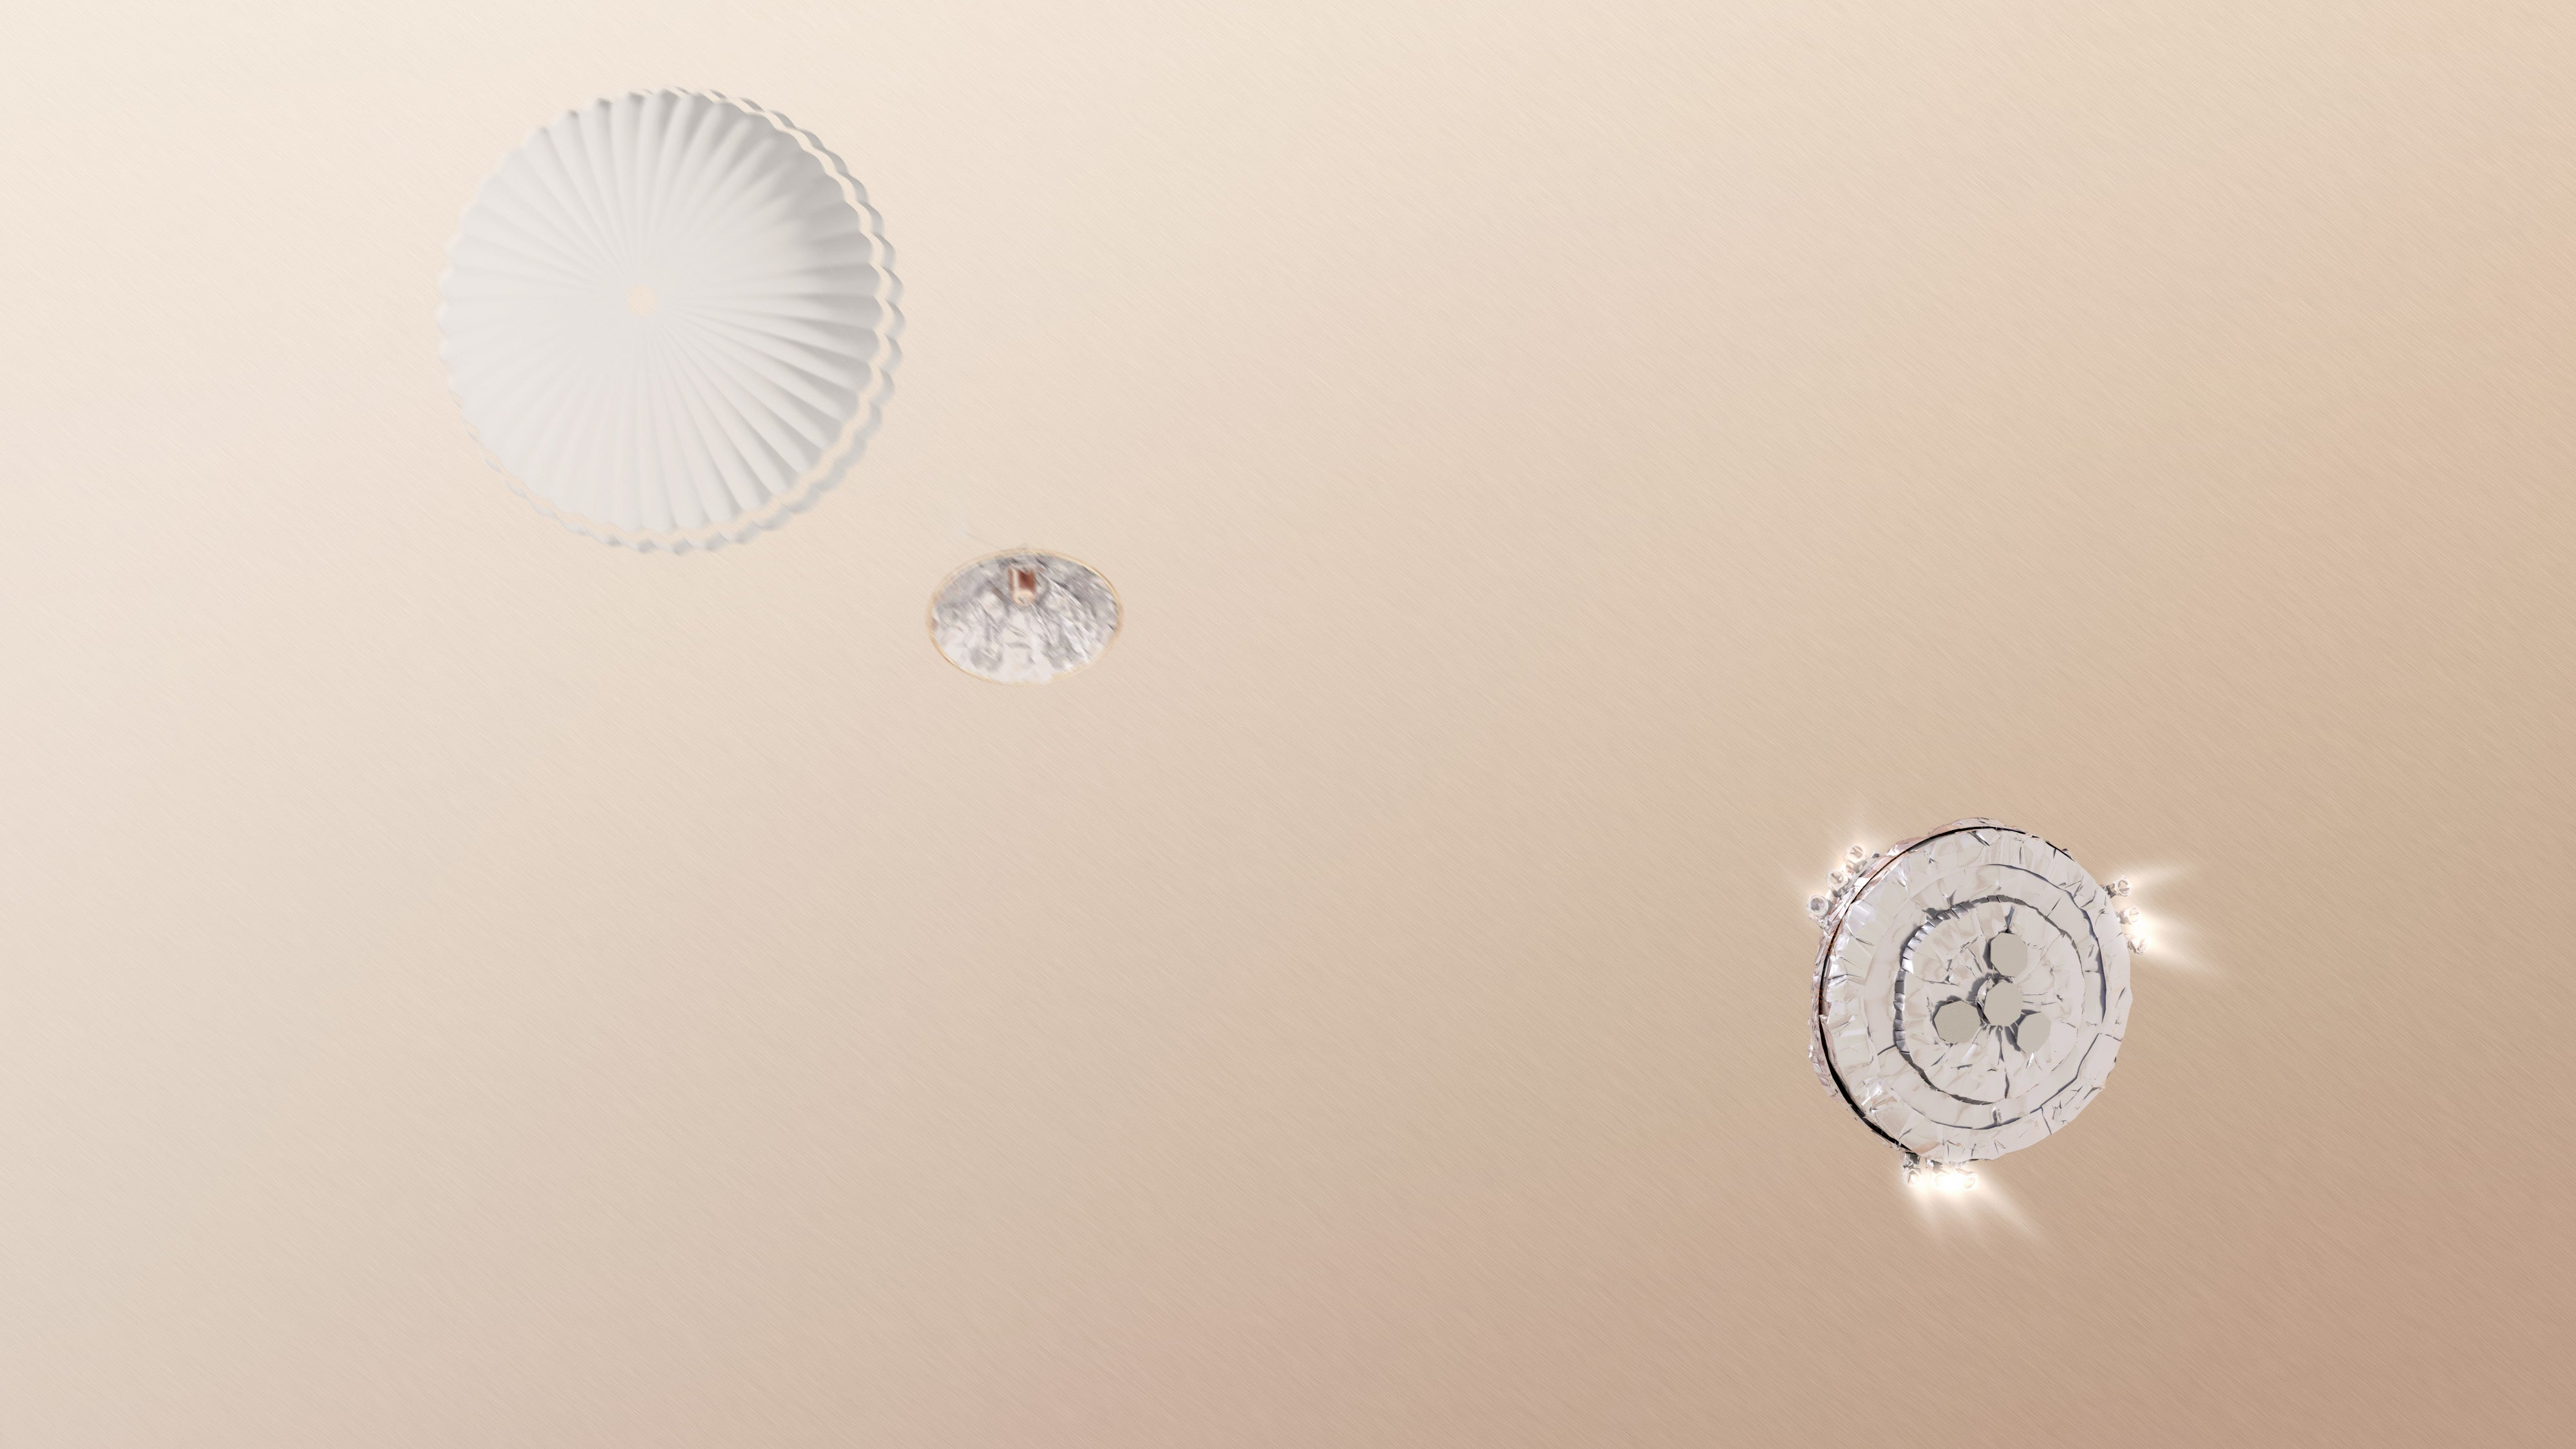 Software Error Implicated In Crash Of Mars Lander